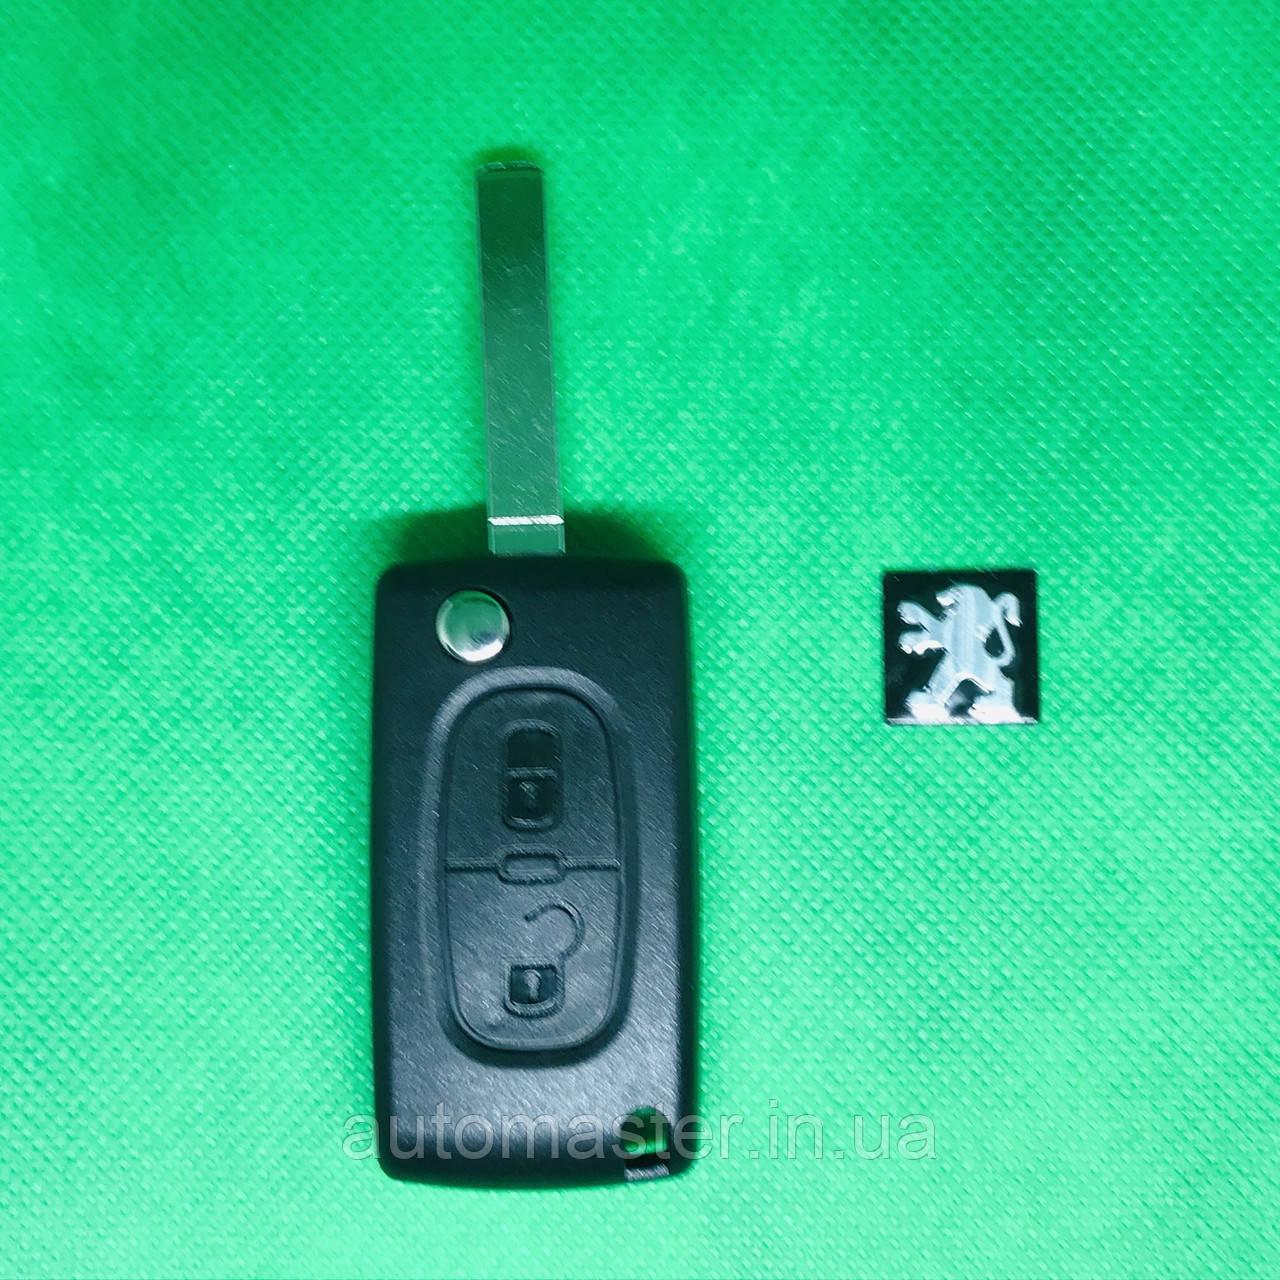 Корпус выкидного авто ключа для PEUGEOT (Пежо) 207, 307, 308, 3008, 4007, 2 - кнопки батарейка на плате